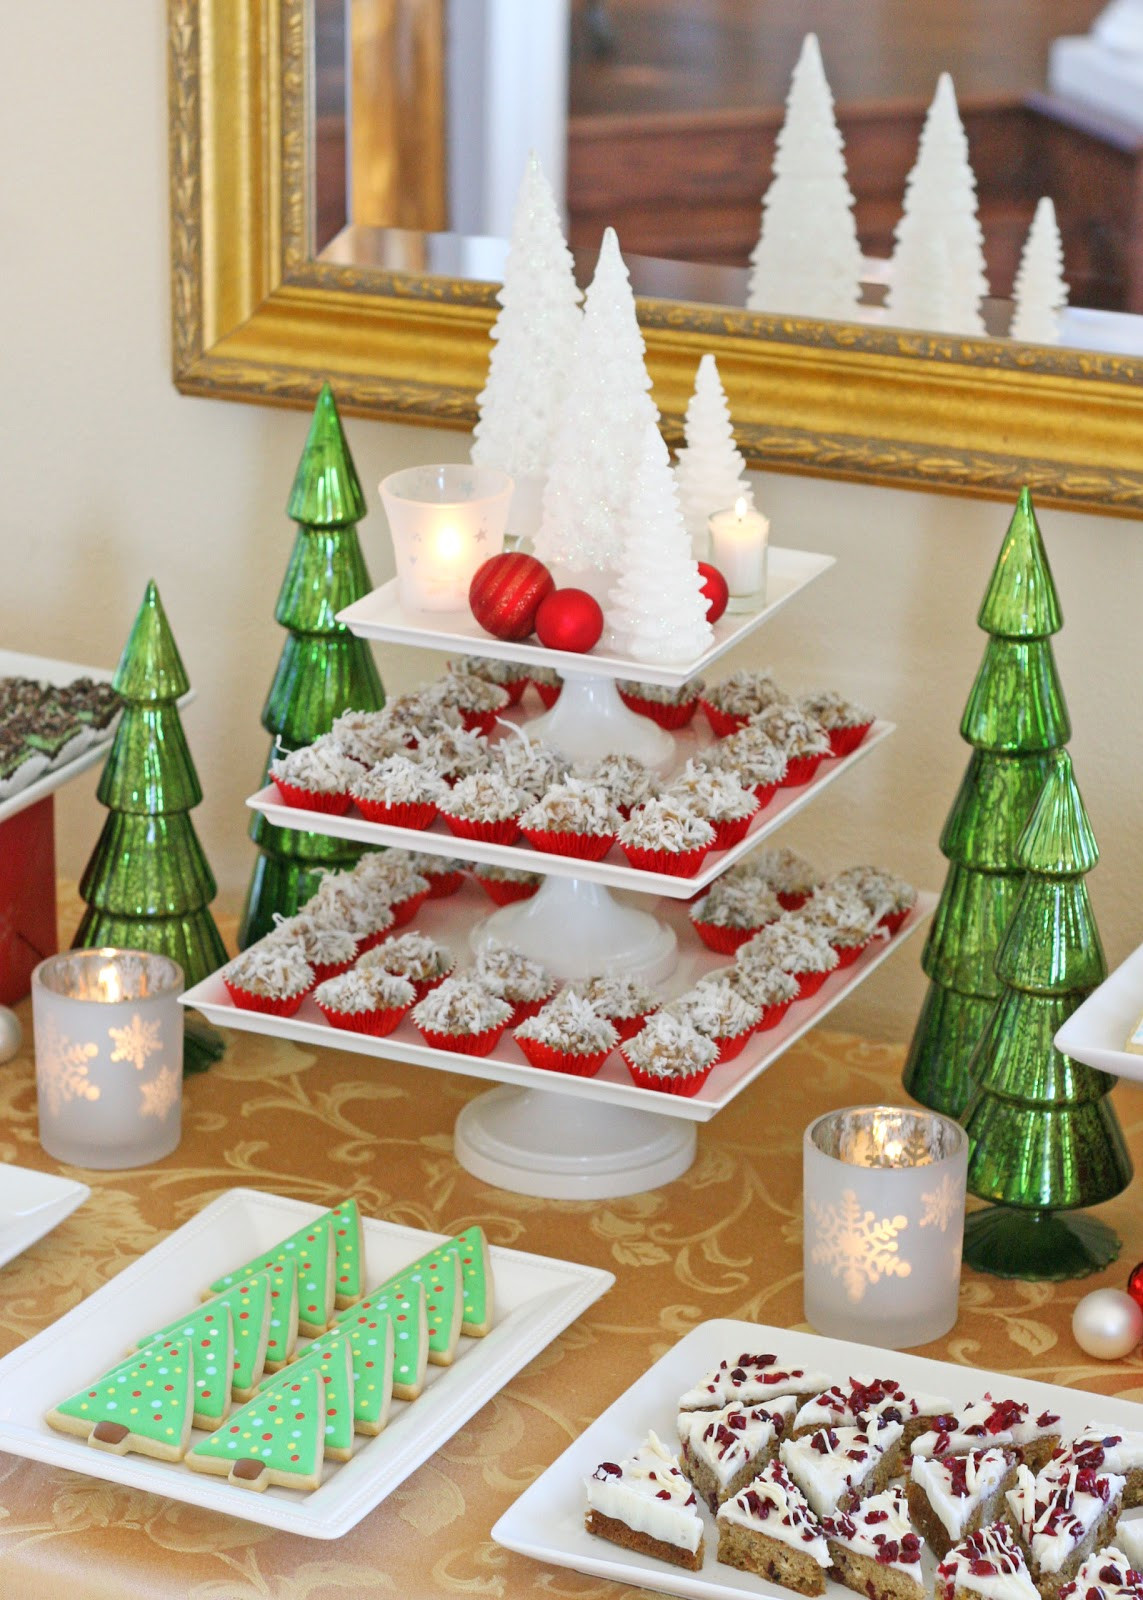 Christmas Desserts Ideas  Classic Holiday Dessert Table Glorious Treats